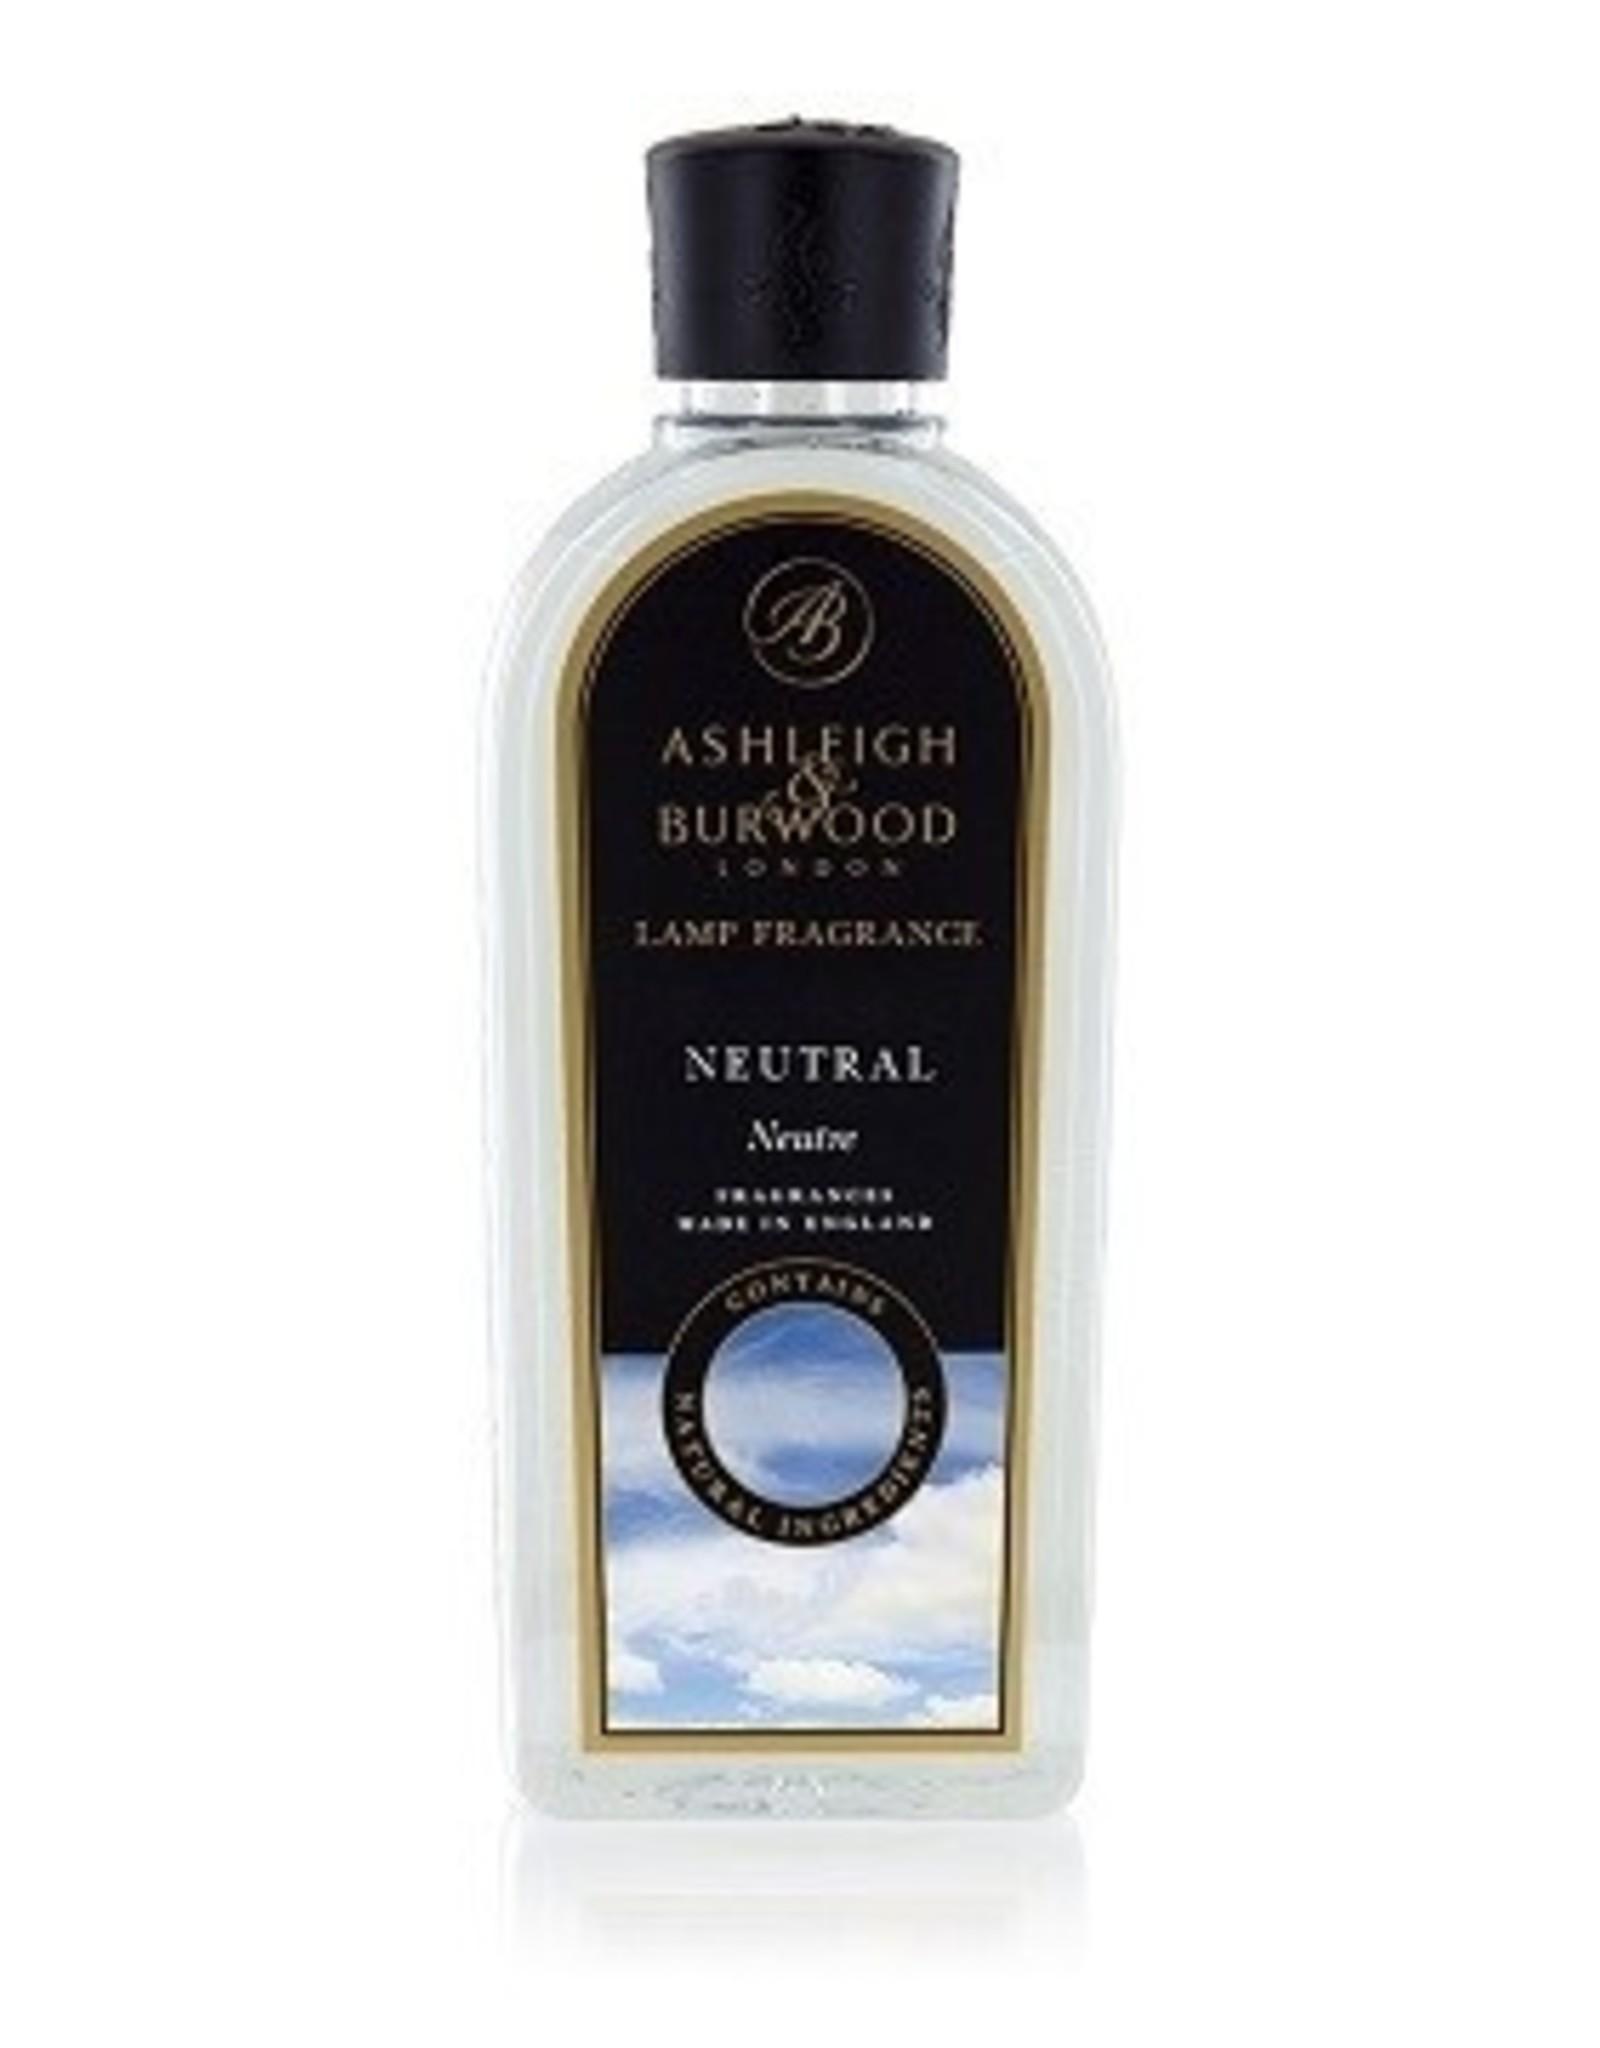 Ashleigh & Burwood Neutral (geurloos) 500ml Geurlampolie - Ashleigh & Burwood